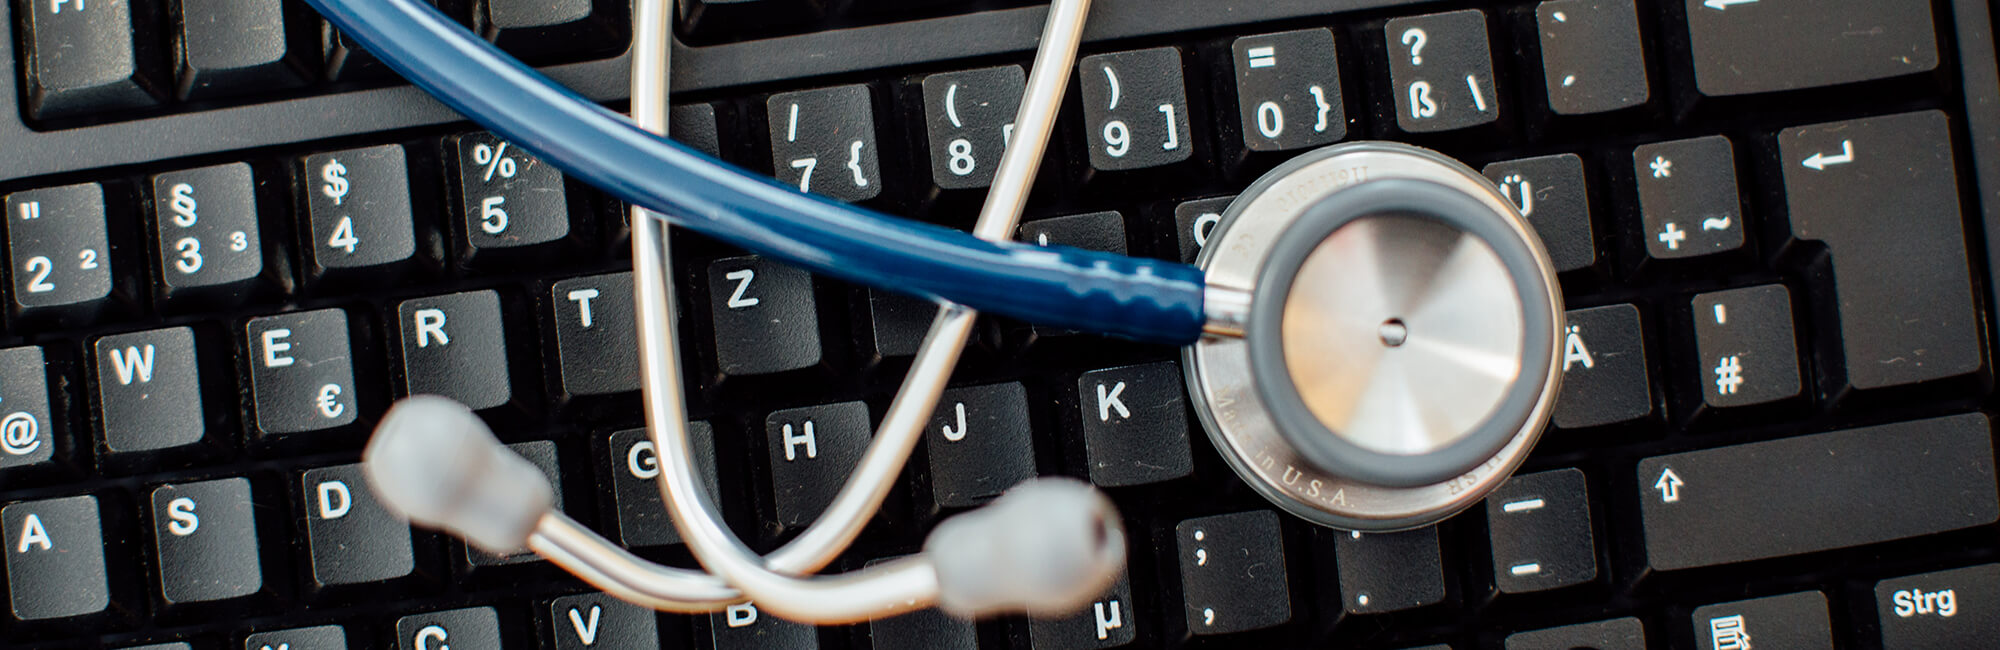 Hausarzt Ampfing - Feige - Slider Kontakt